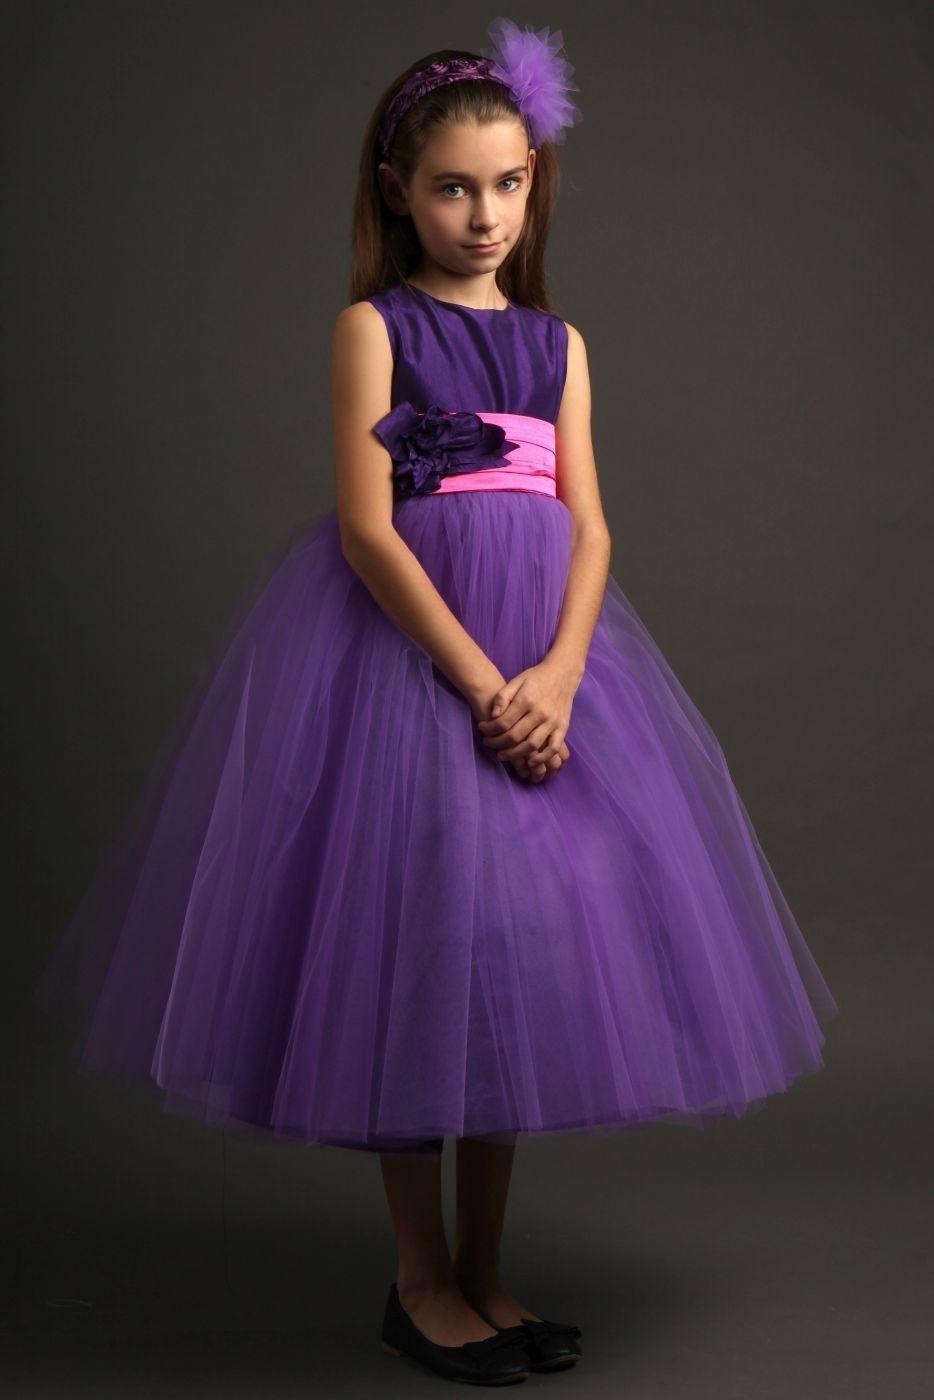 15 Genial Lila Kleid Festlich Vertrieb - Abendkleid